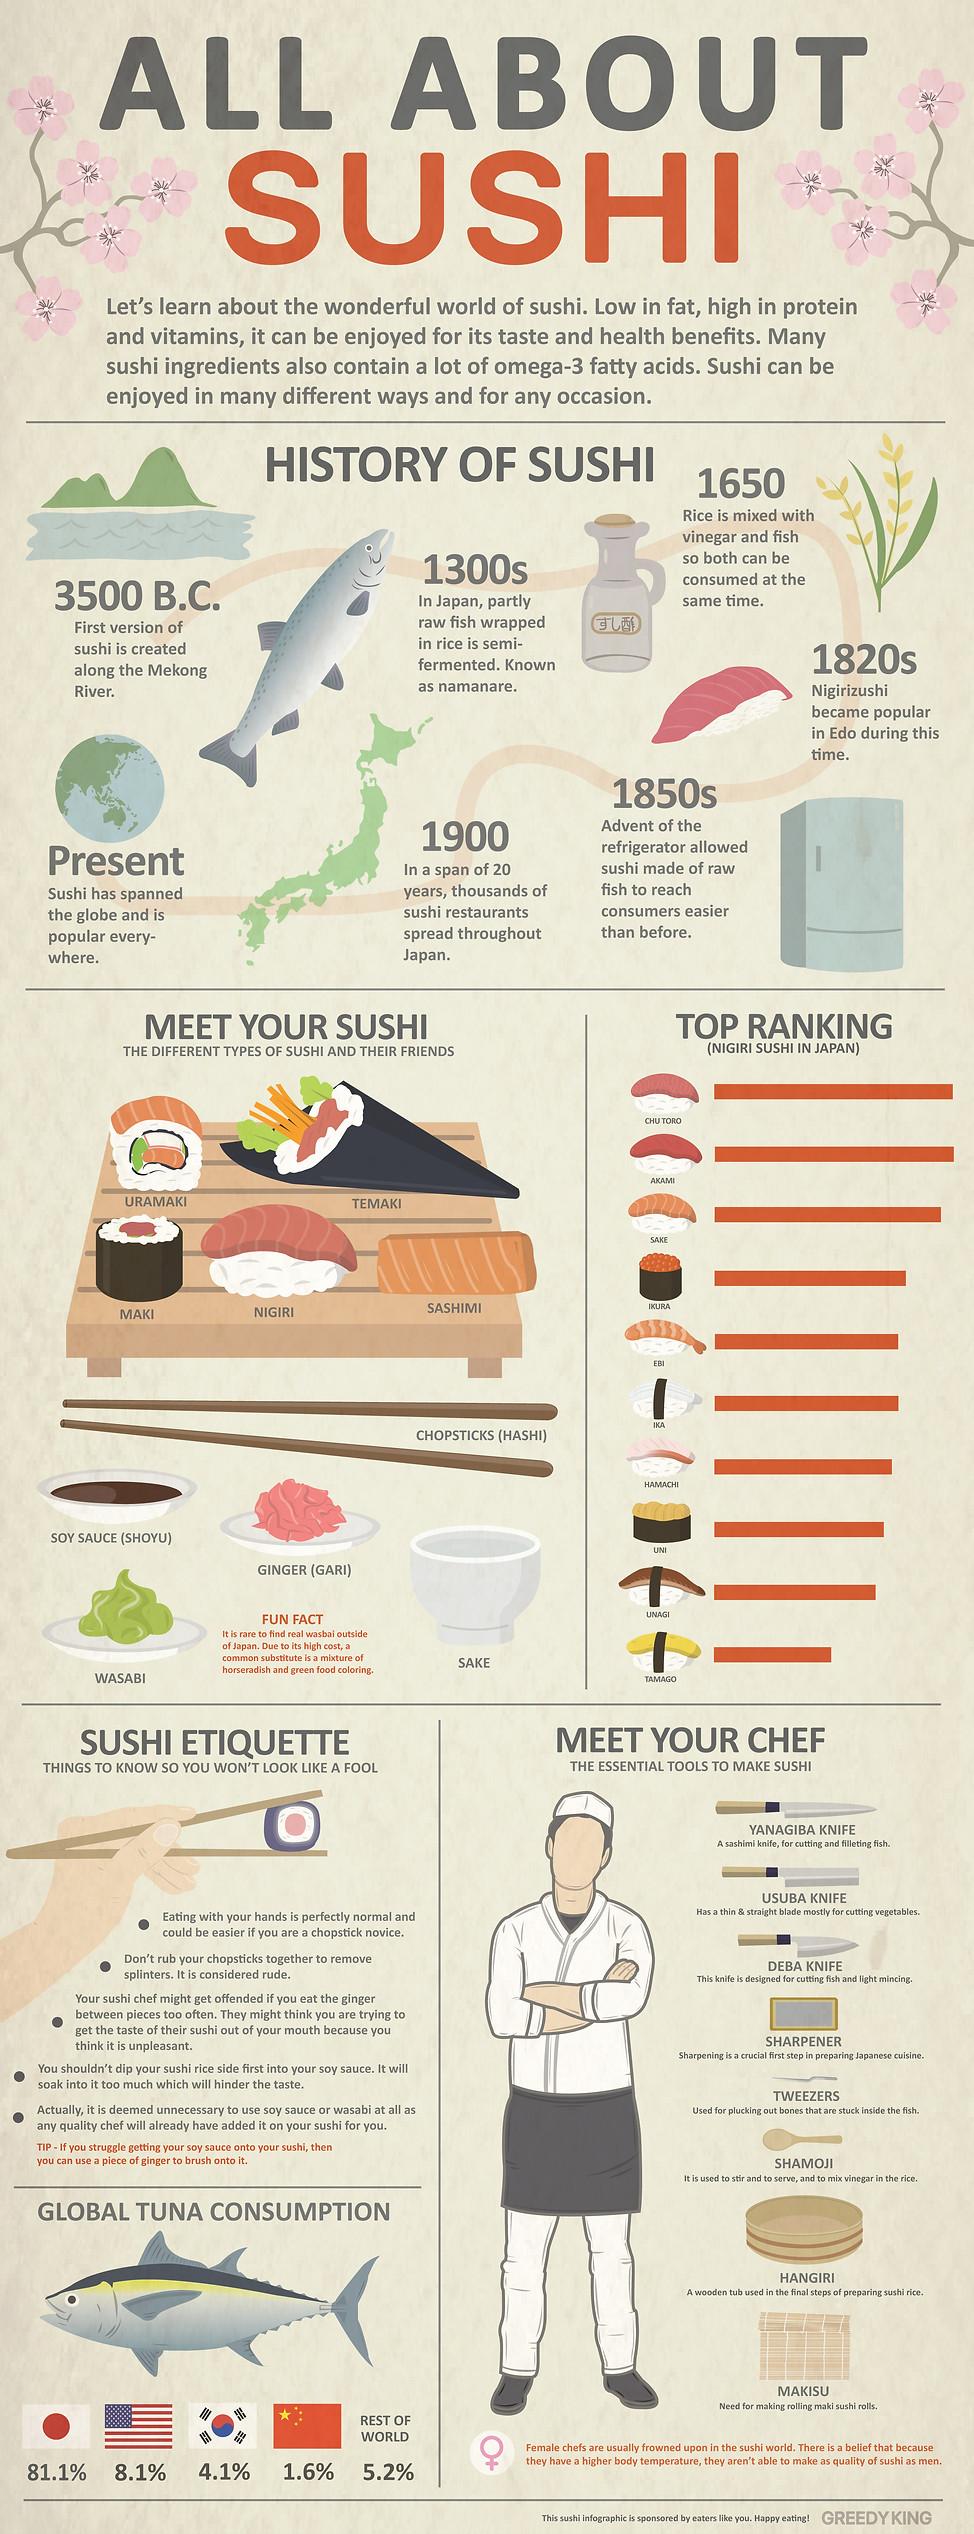 sushi-infographic-final.jpg